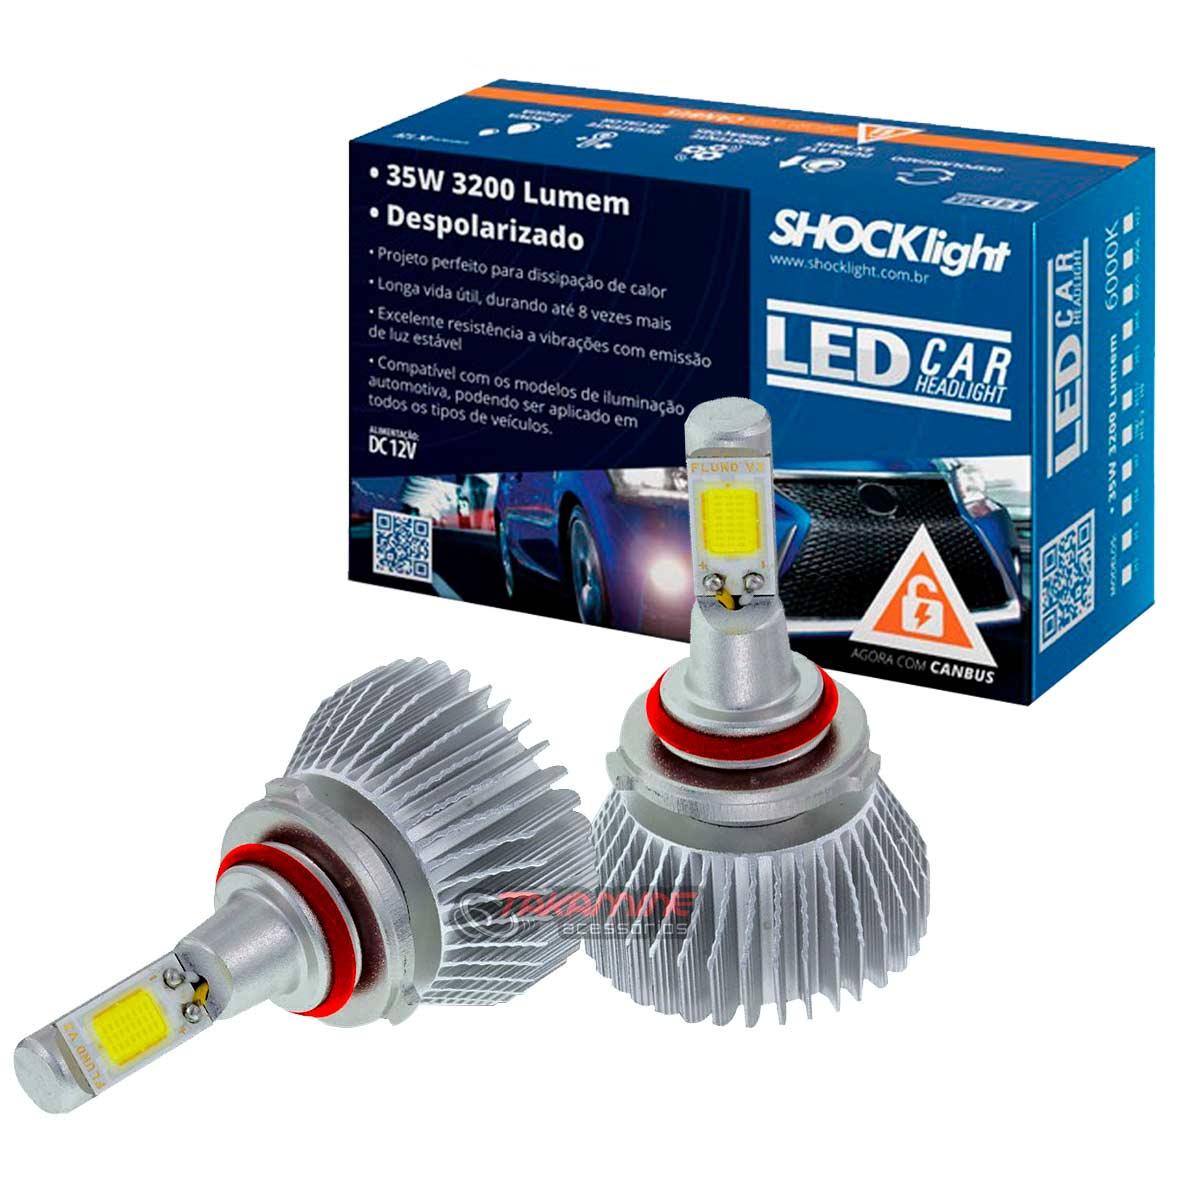 Kit LED 2D Headlight  tipo xenon modelo HB3 35W